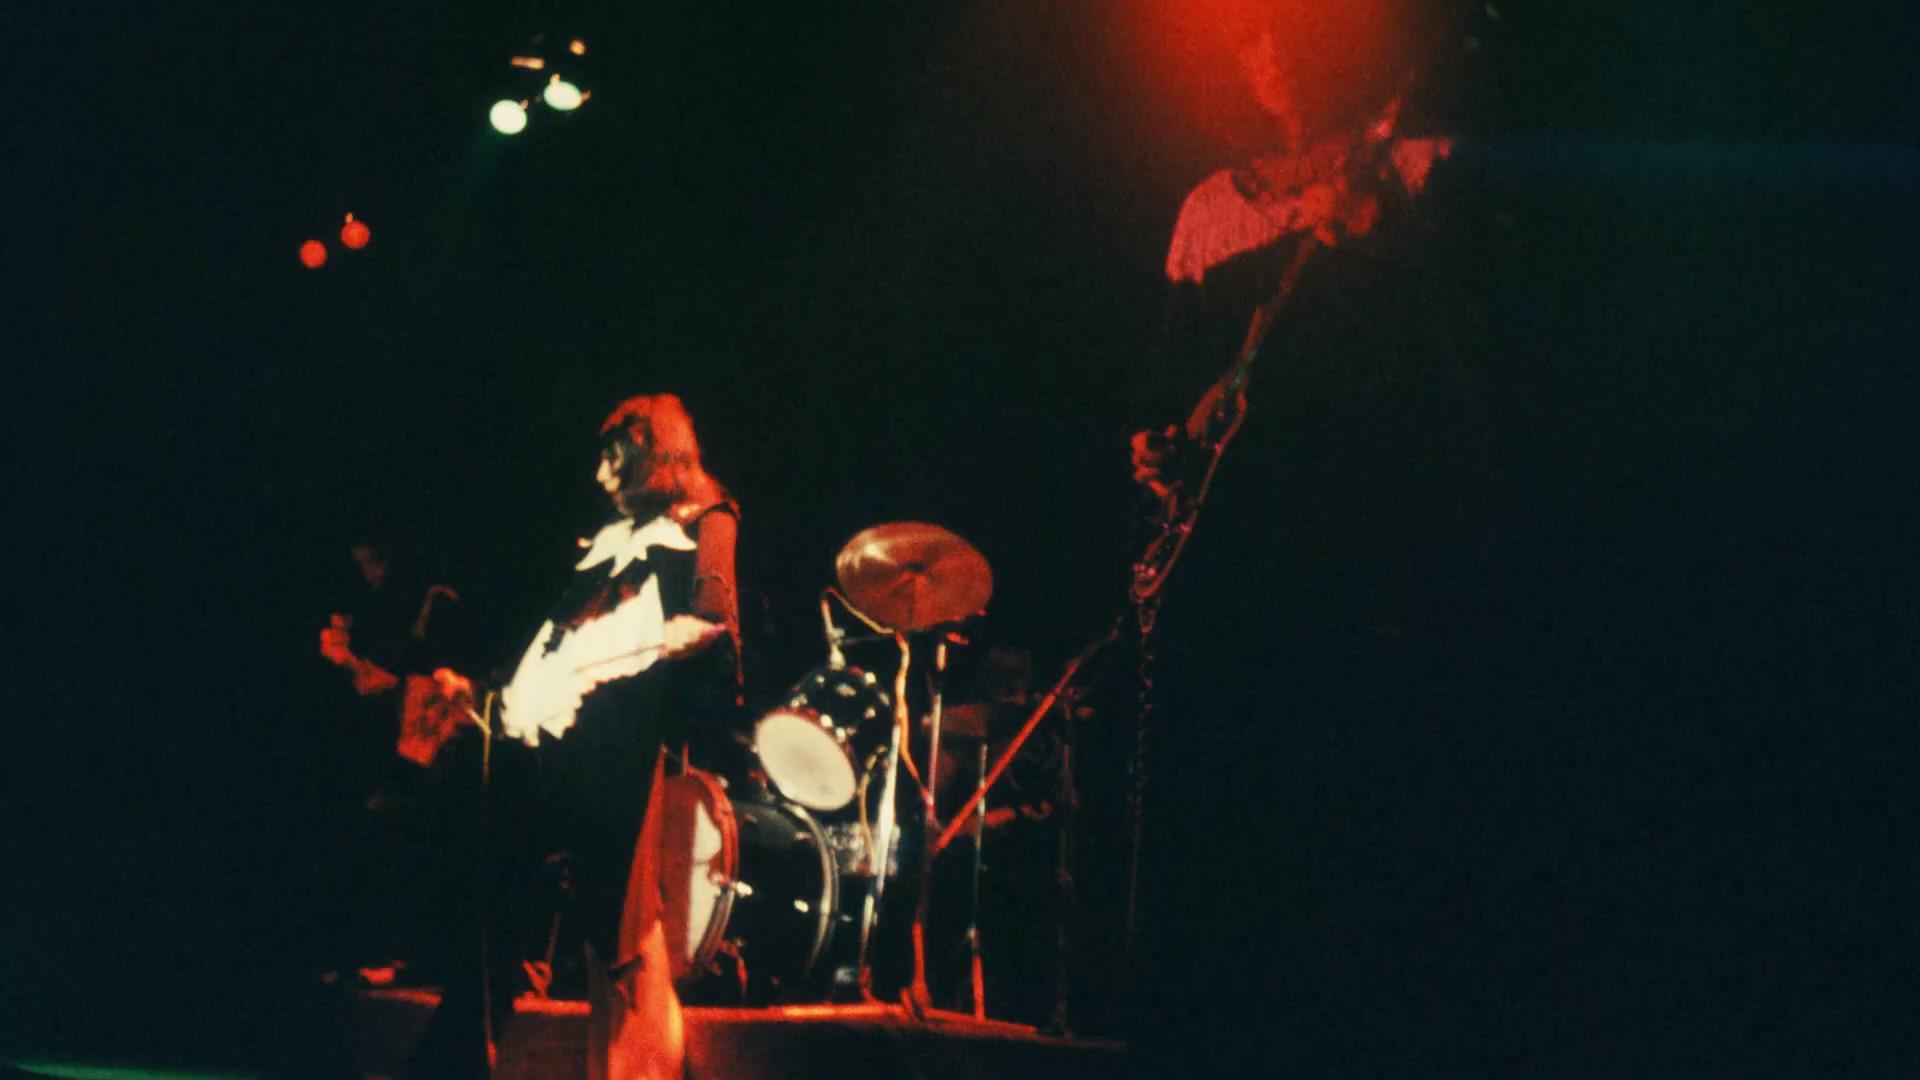 queen-rare-photo-rainbow-1974-4